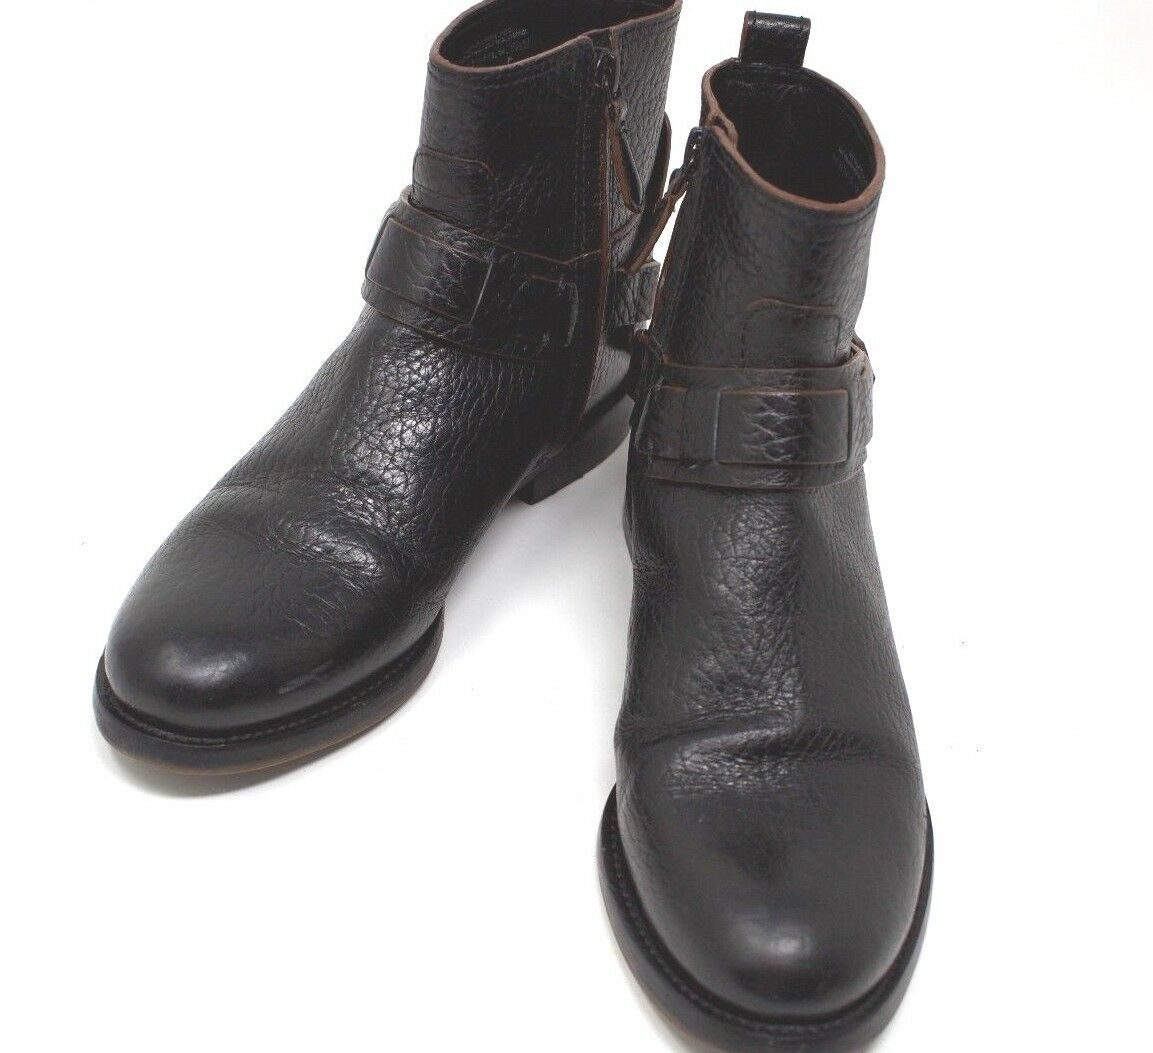 Tory Burch Color Negro Cuero Mujer Botines Zapato Tamaño 5.5